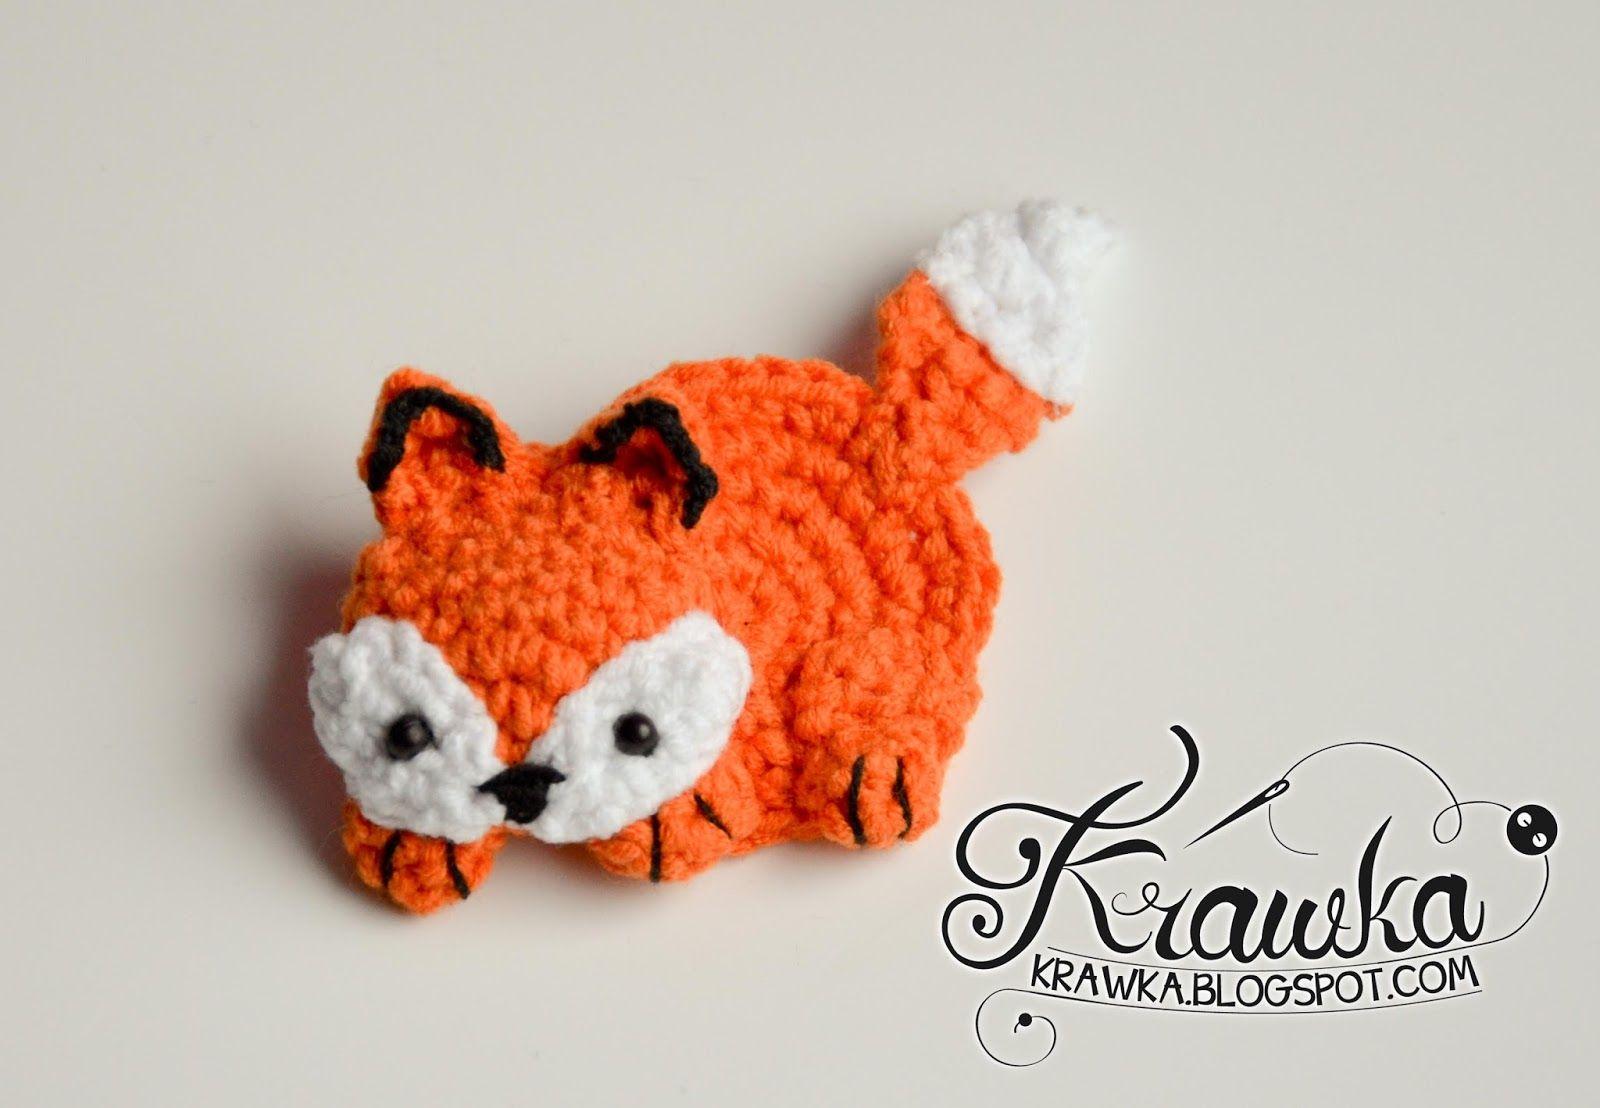 Krawka: Cute orange fox brooch with free pattern. Very fast and easy ...